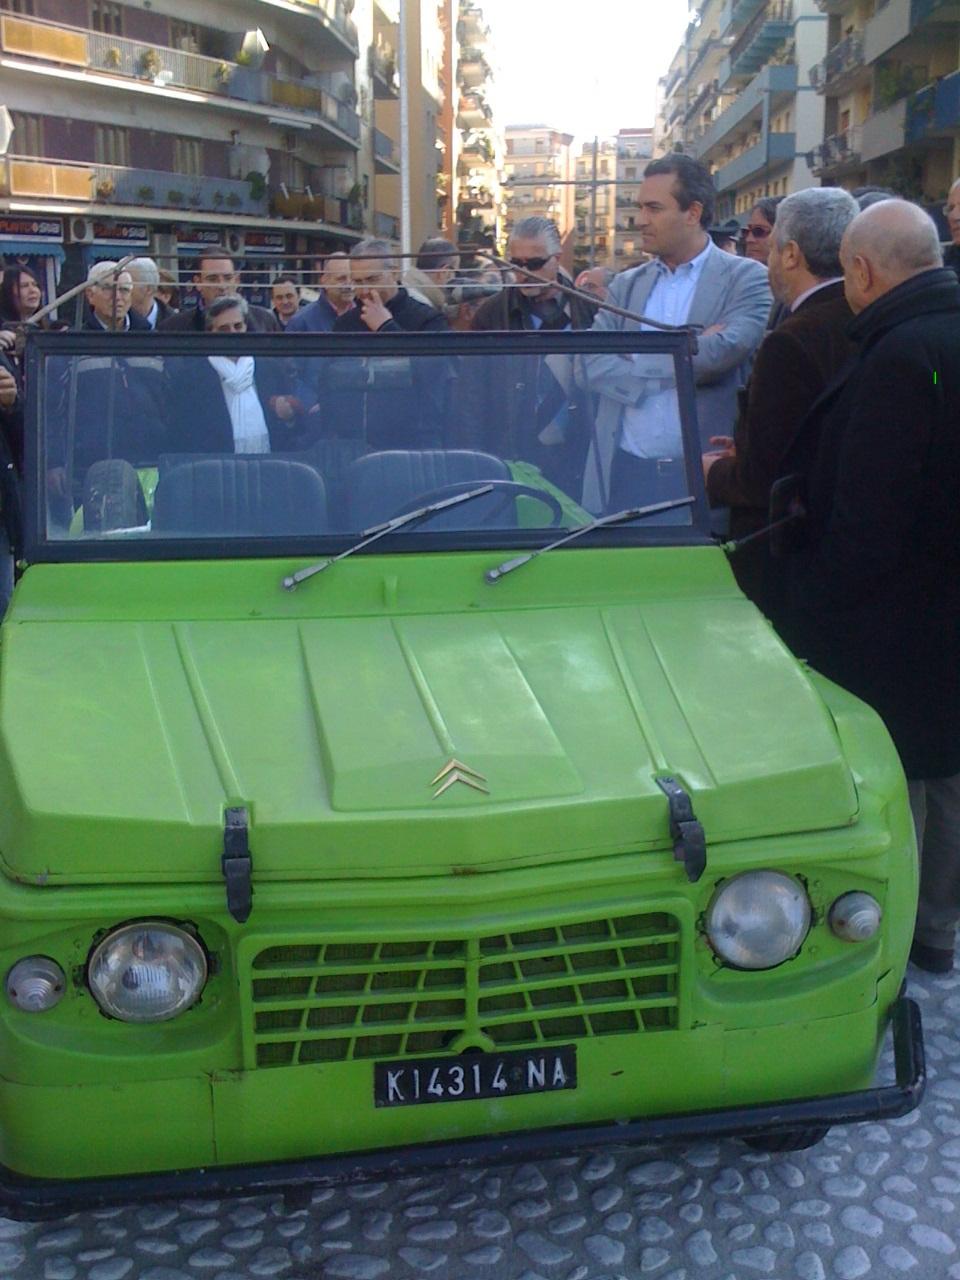 Sindaco inaugura rotatoria con auto Siani